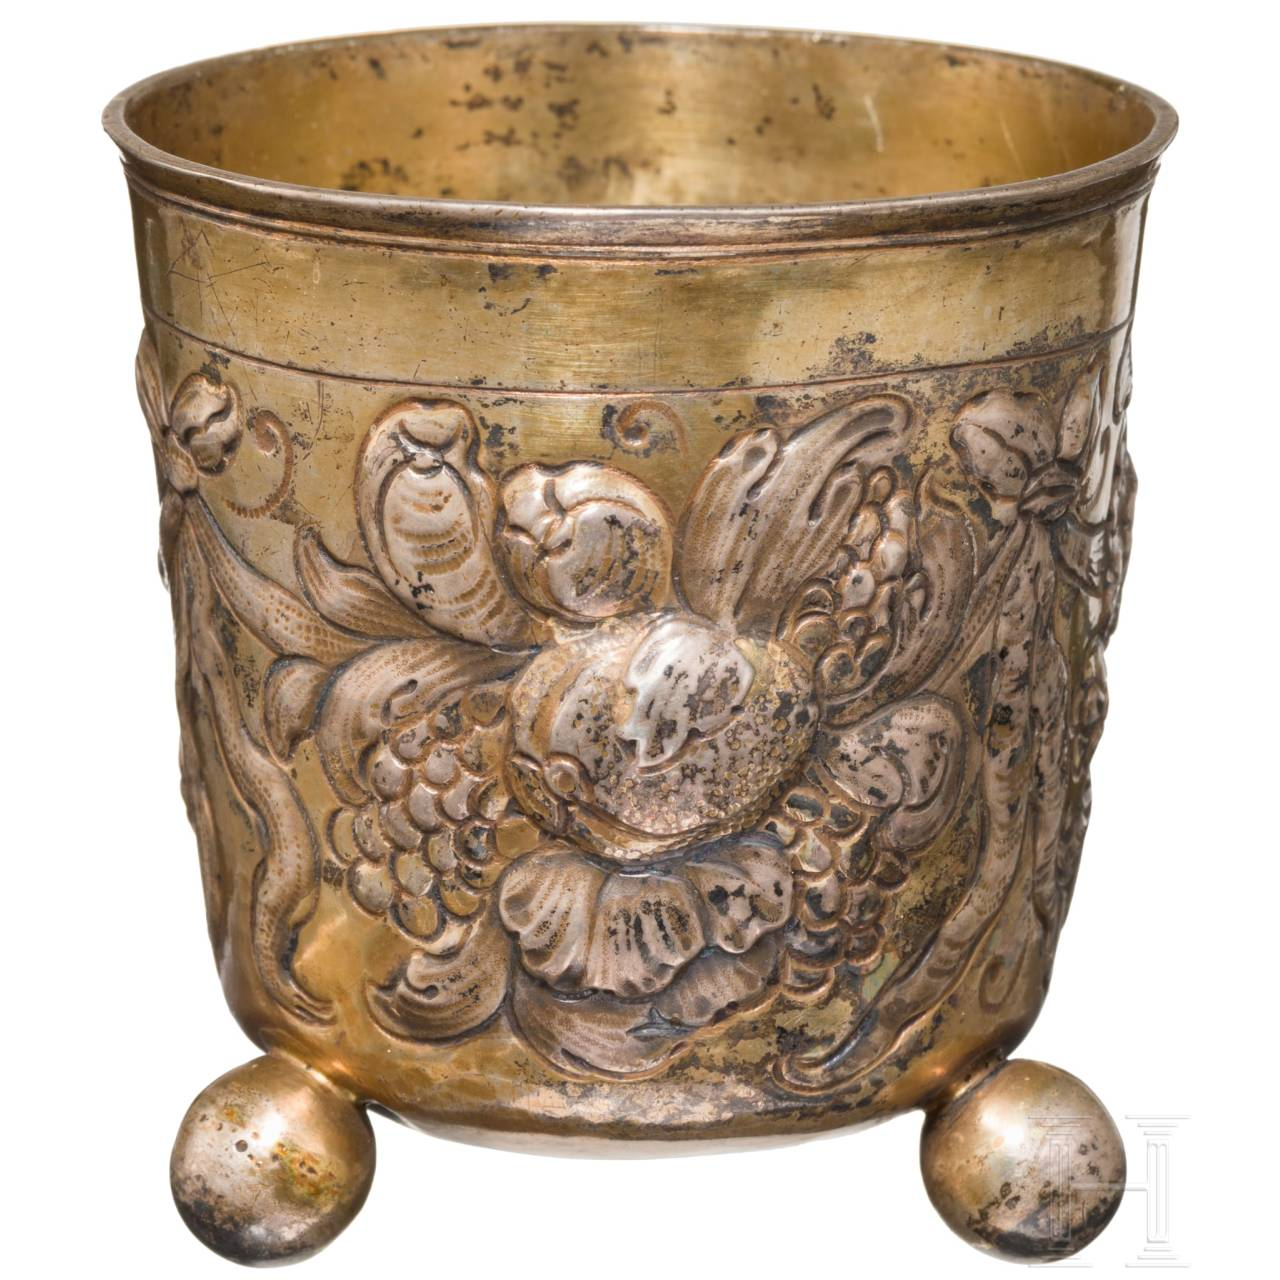 Vergoldeter Kugelfußbecher, Nürnberg, um 1690